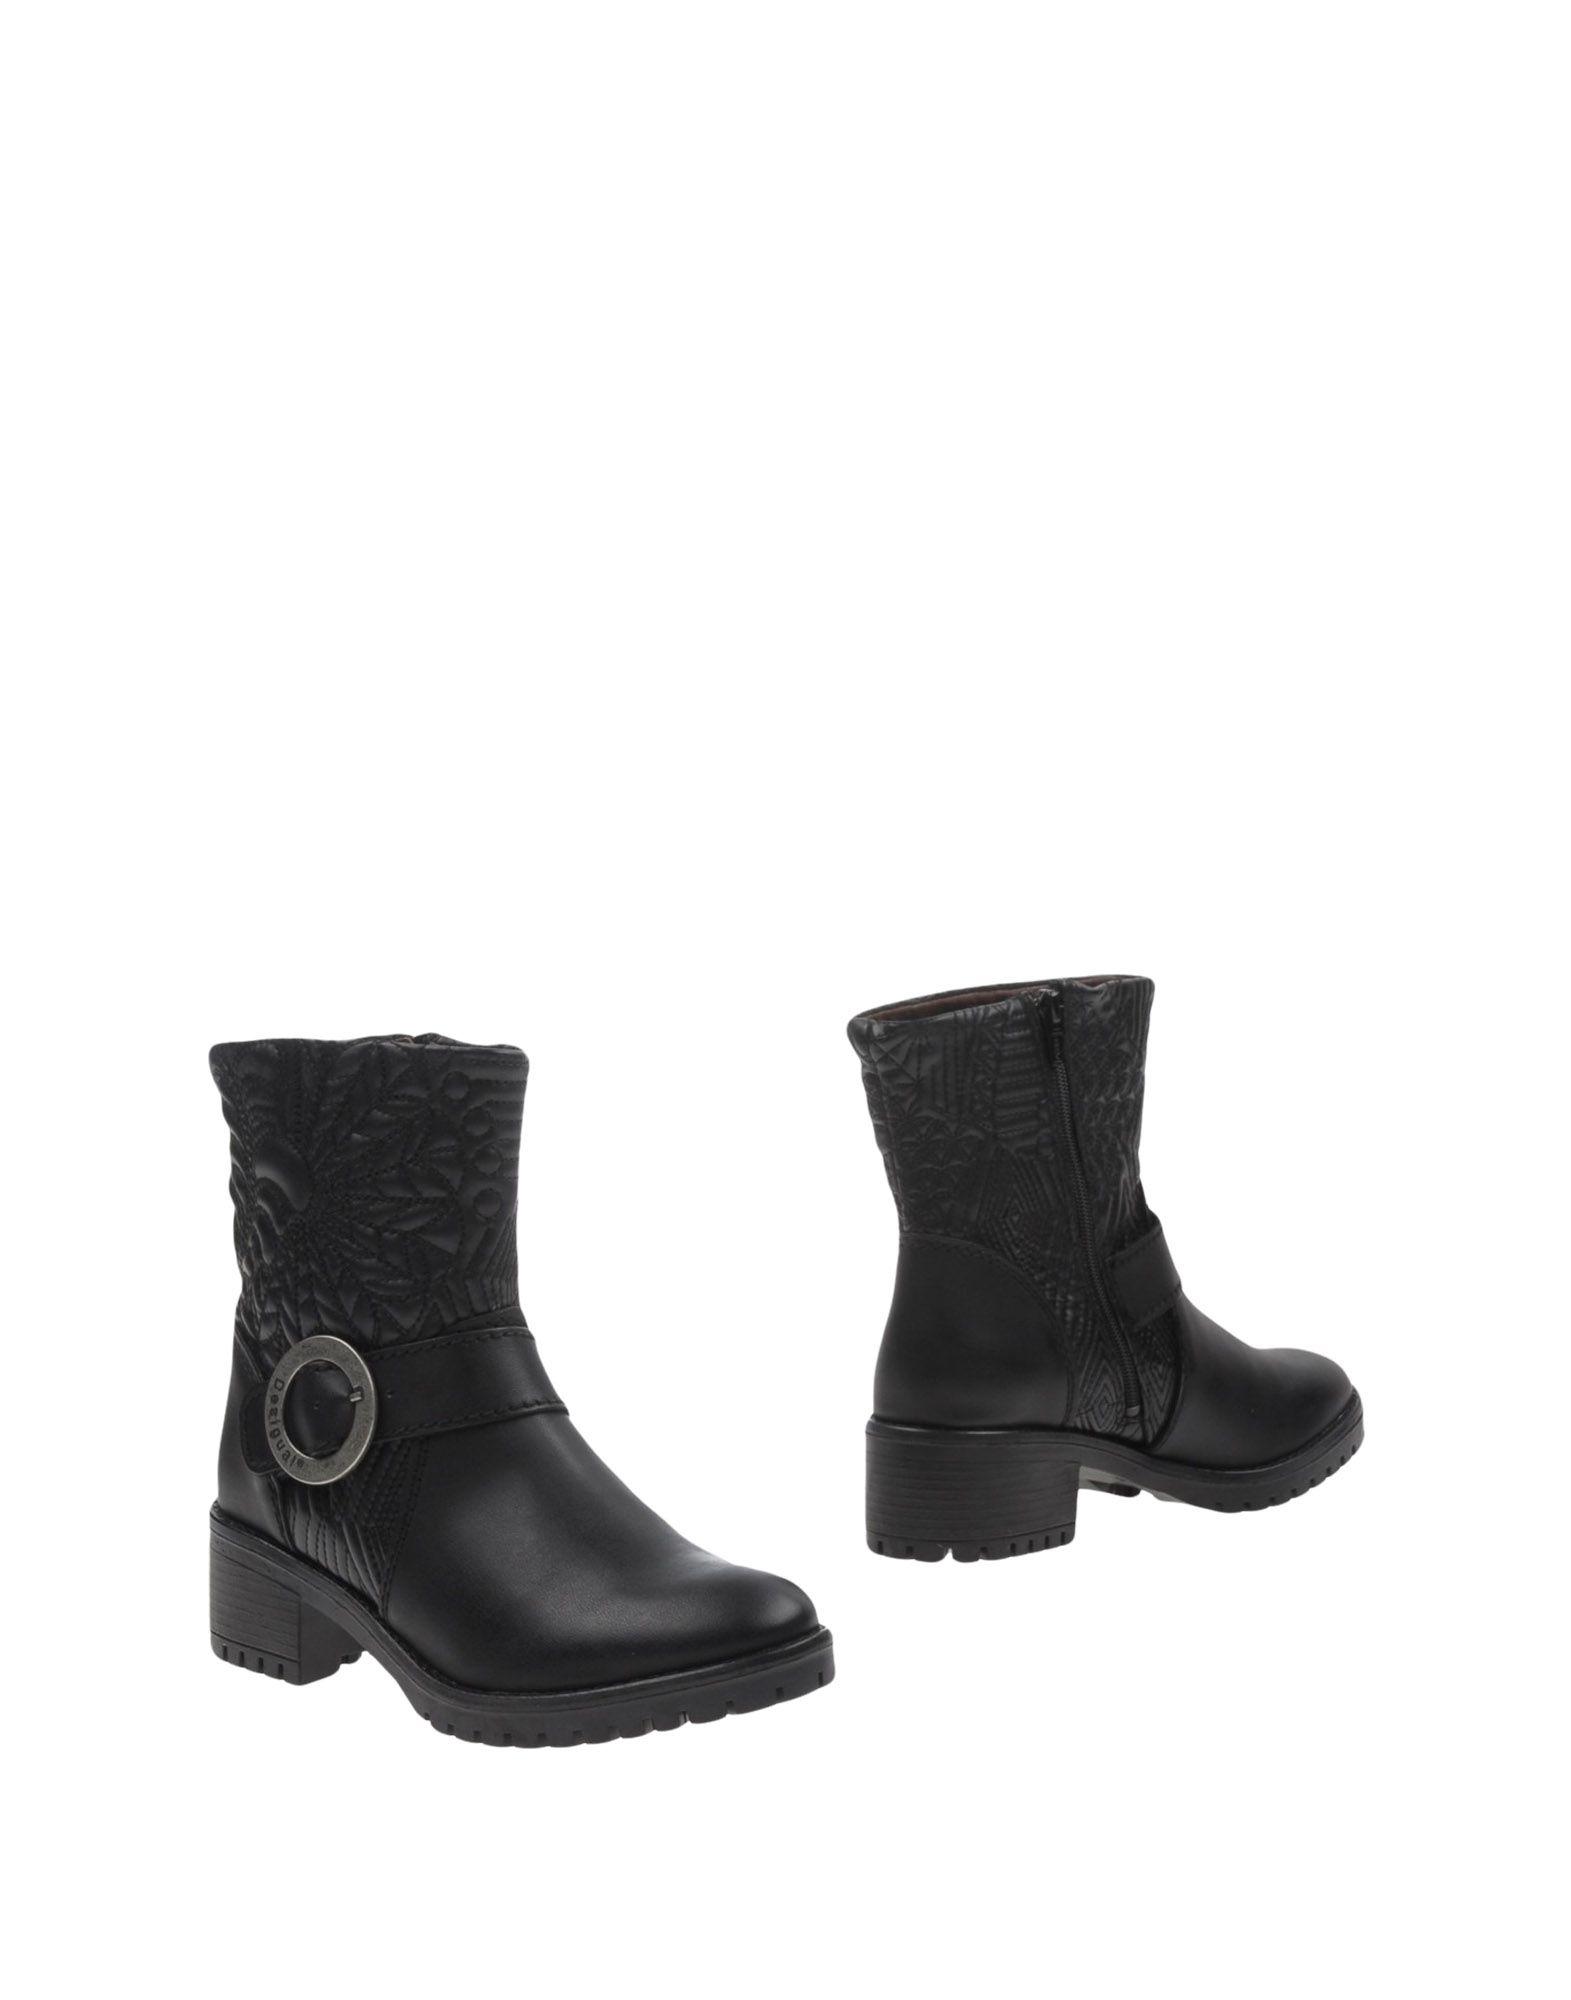 Stivaletti Desigual Donna - 11372059OH Scarpe comode comode Scarpe e distintive 28994b